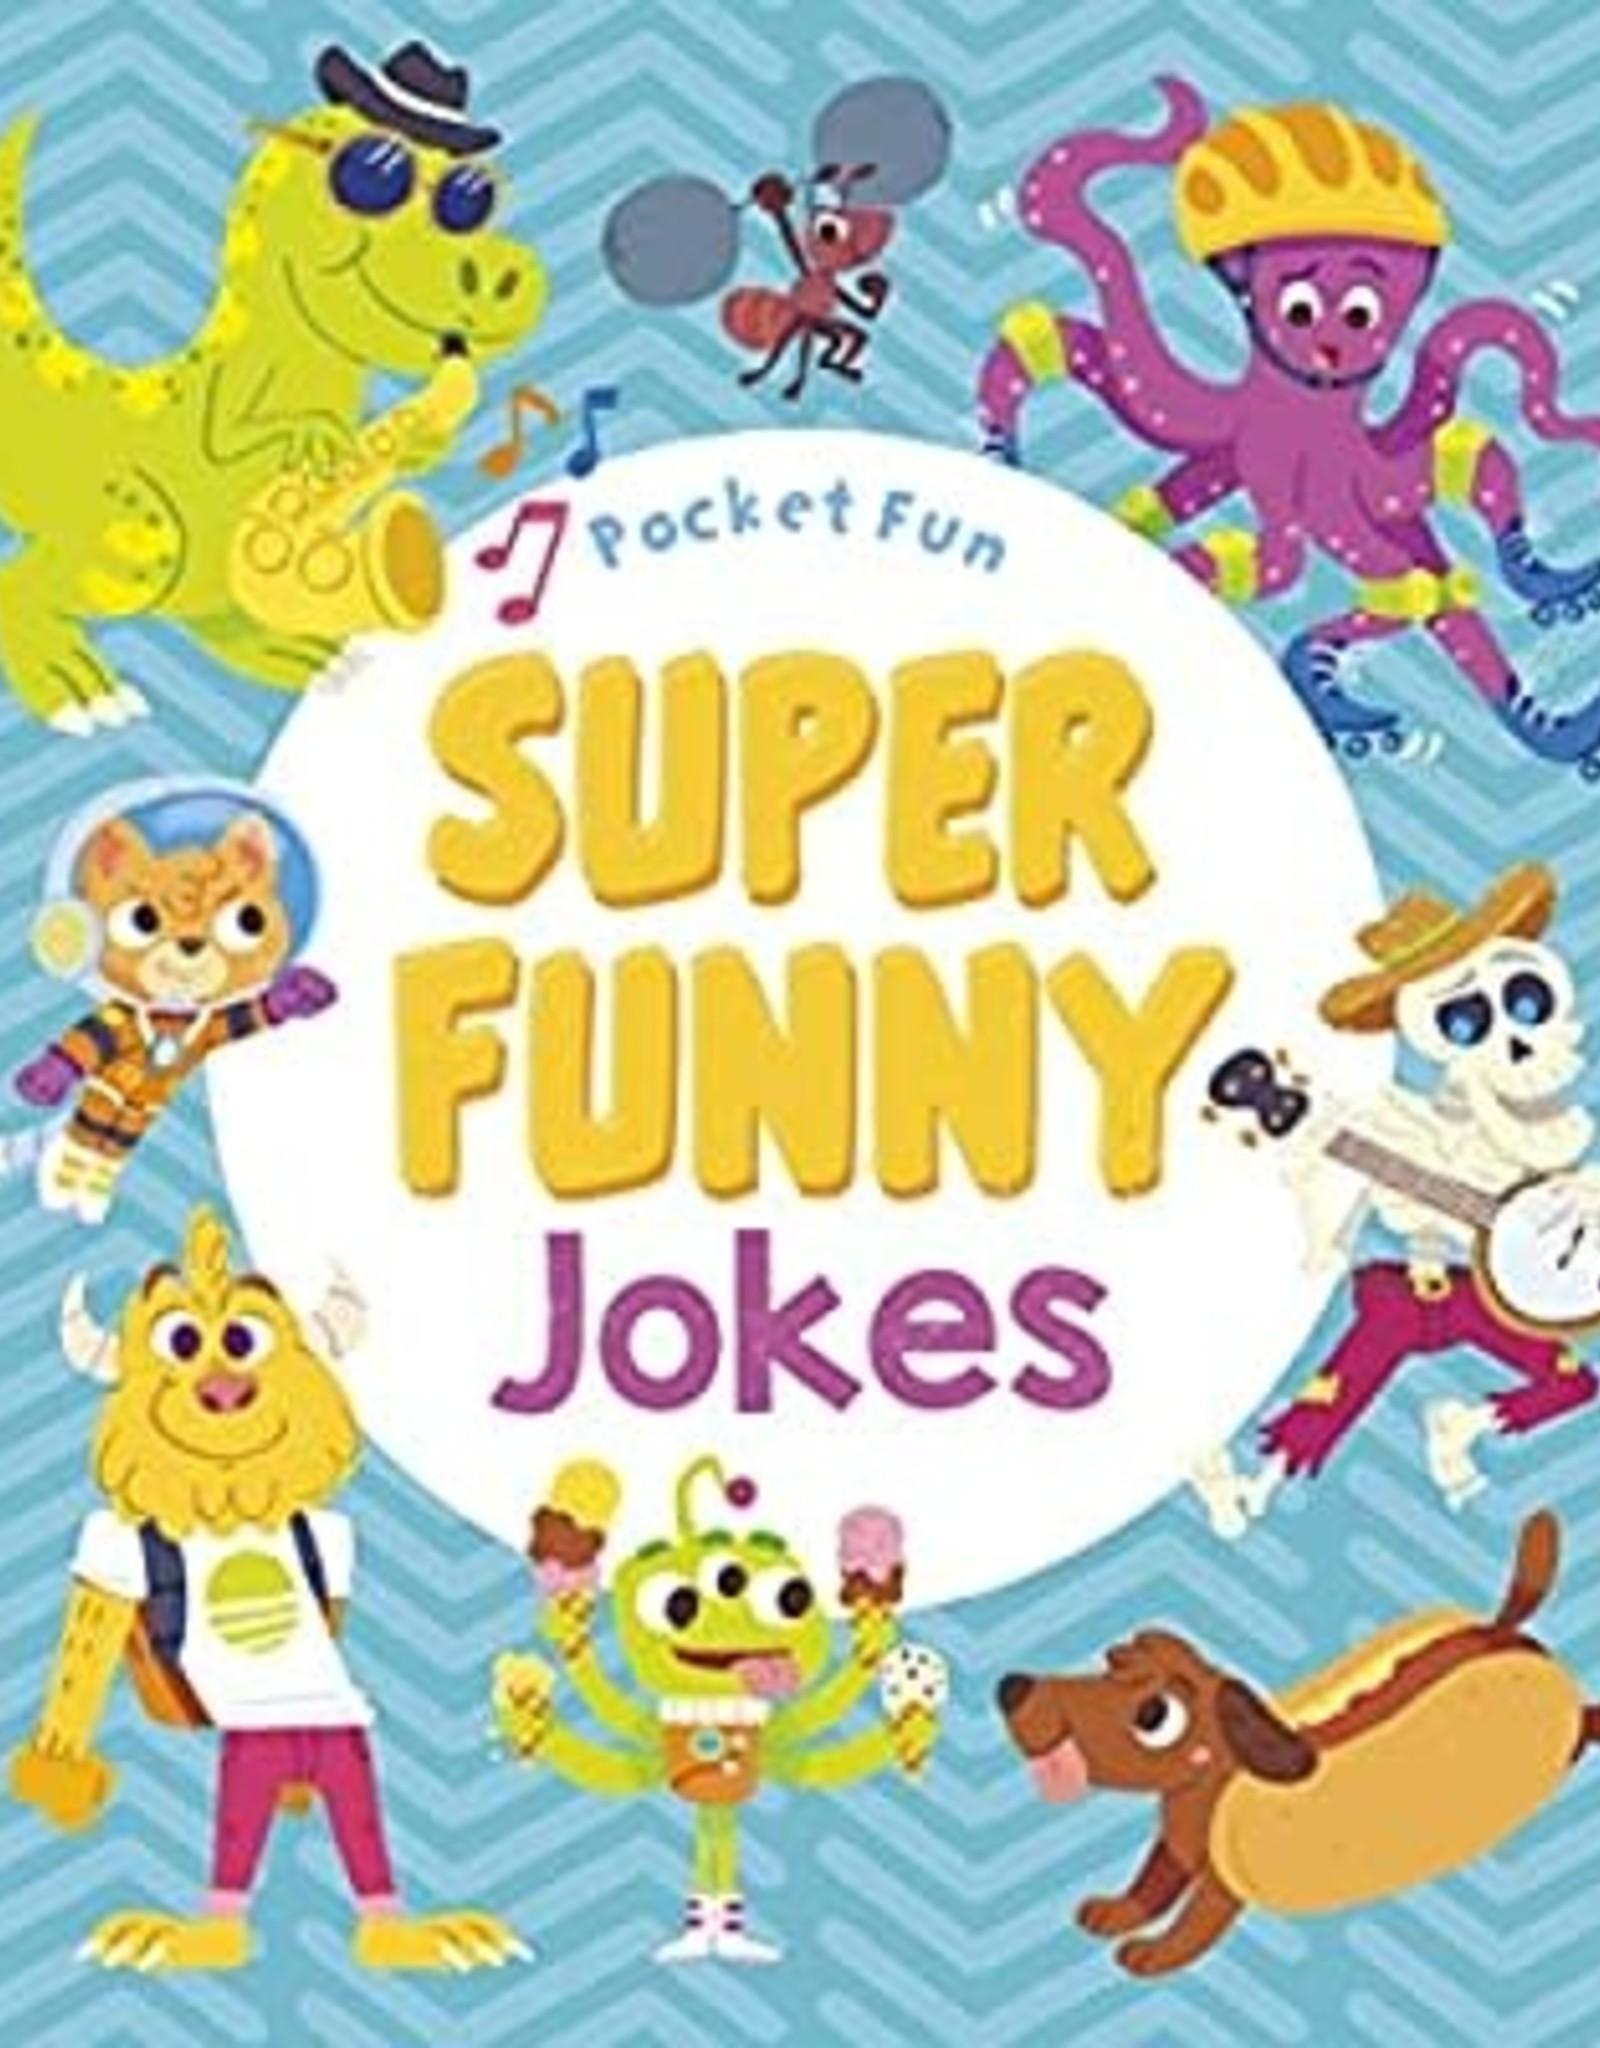 Baker and Taylor Publishers Pocket Fun: Super Funny Jokes